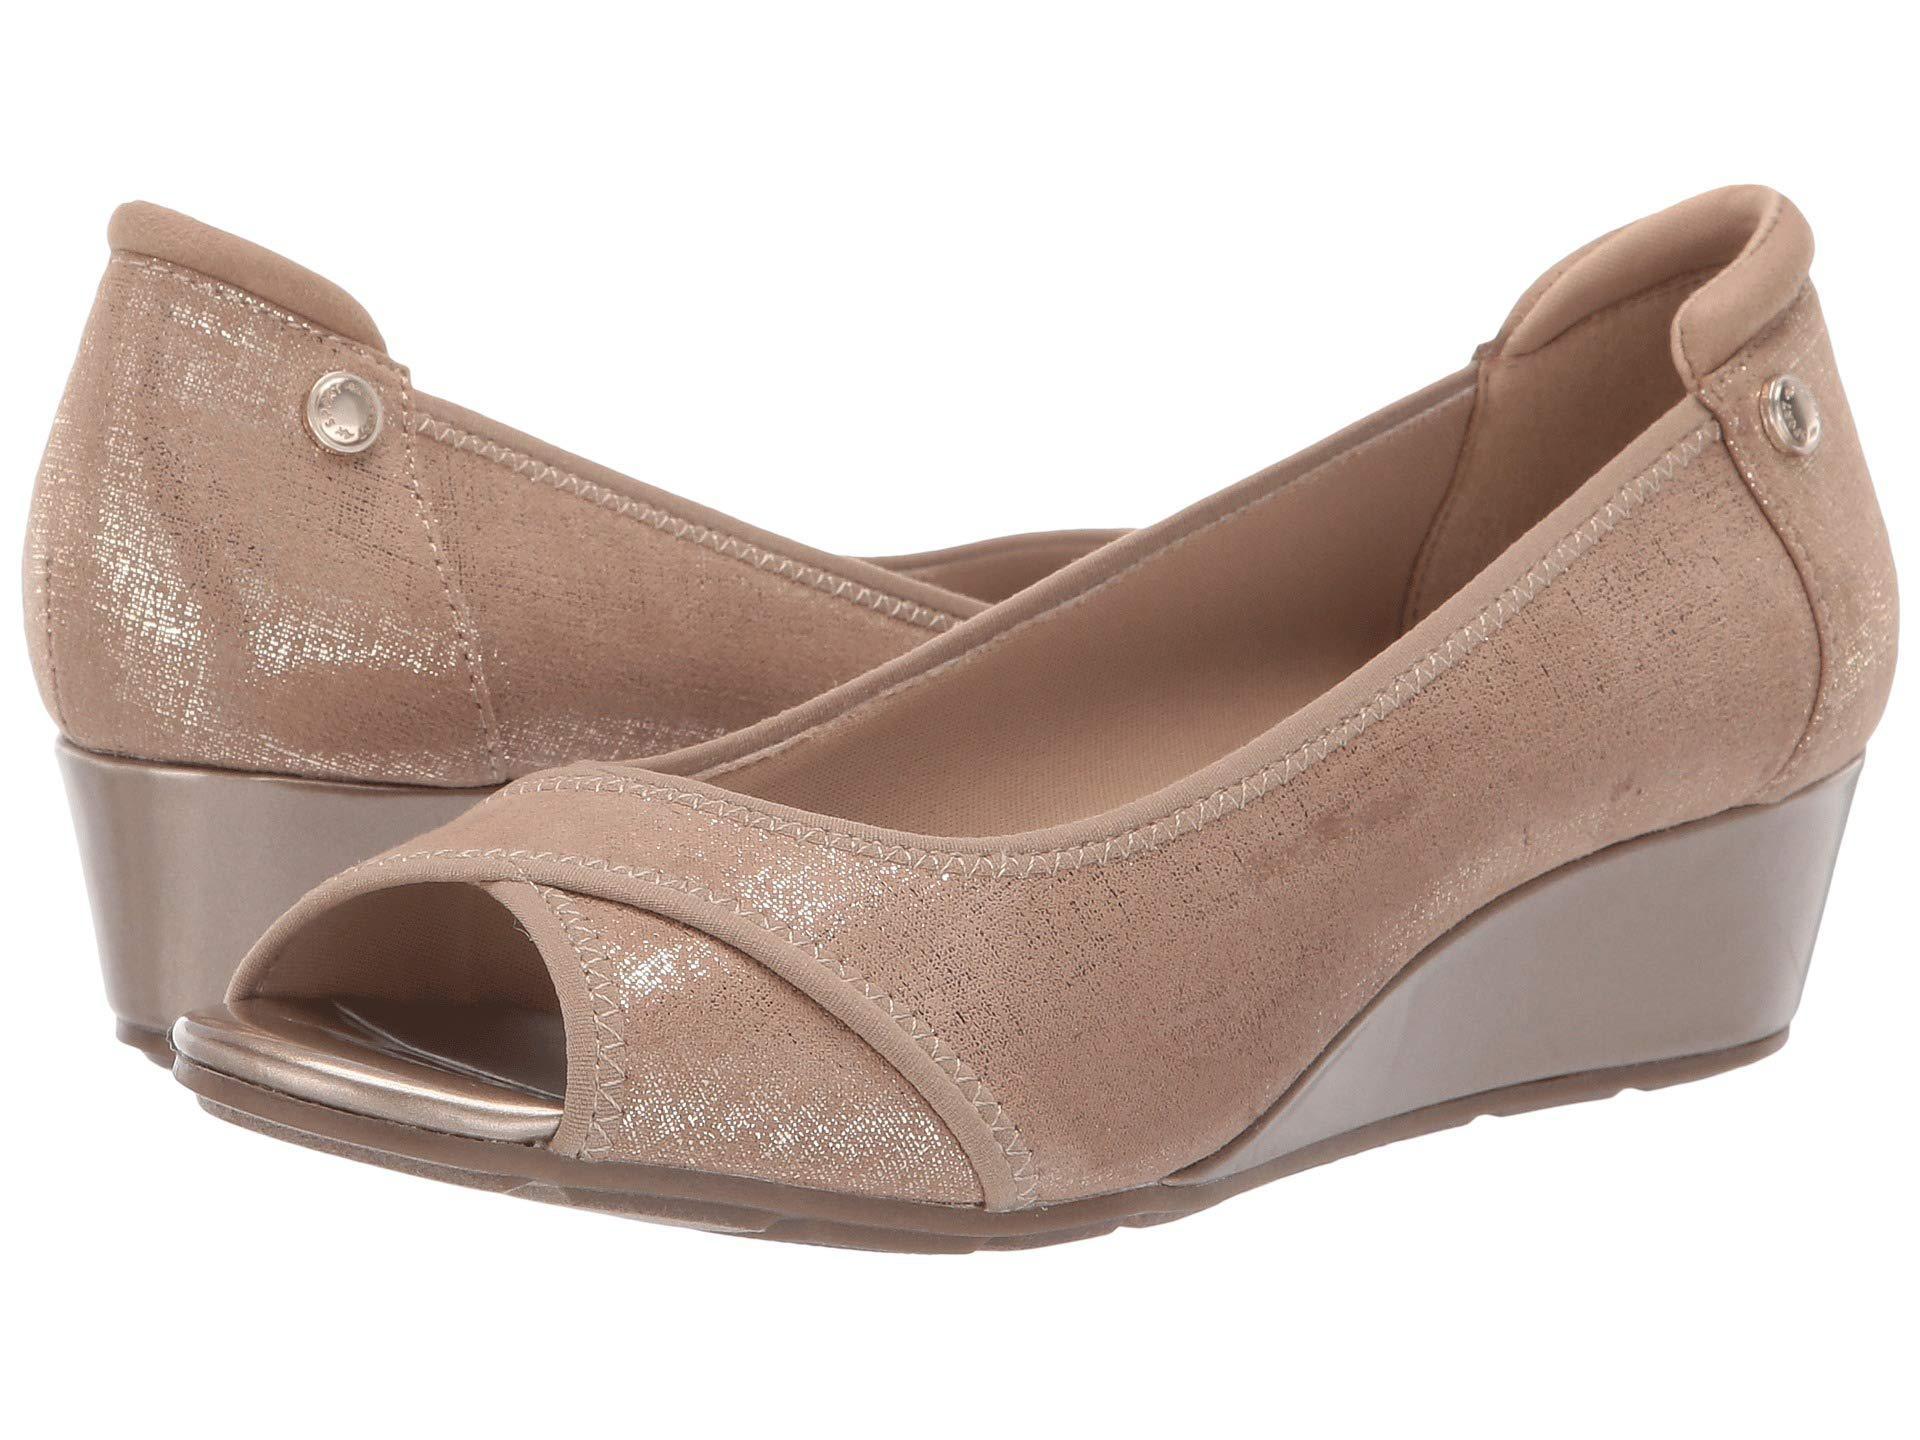 a44e7ffc4cec6 Anne Klein Sport Corner Wedge Heel (black) Women's Wedge Shoes - Lyst